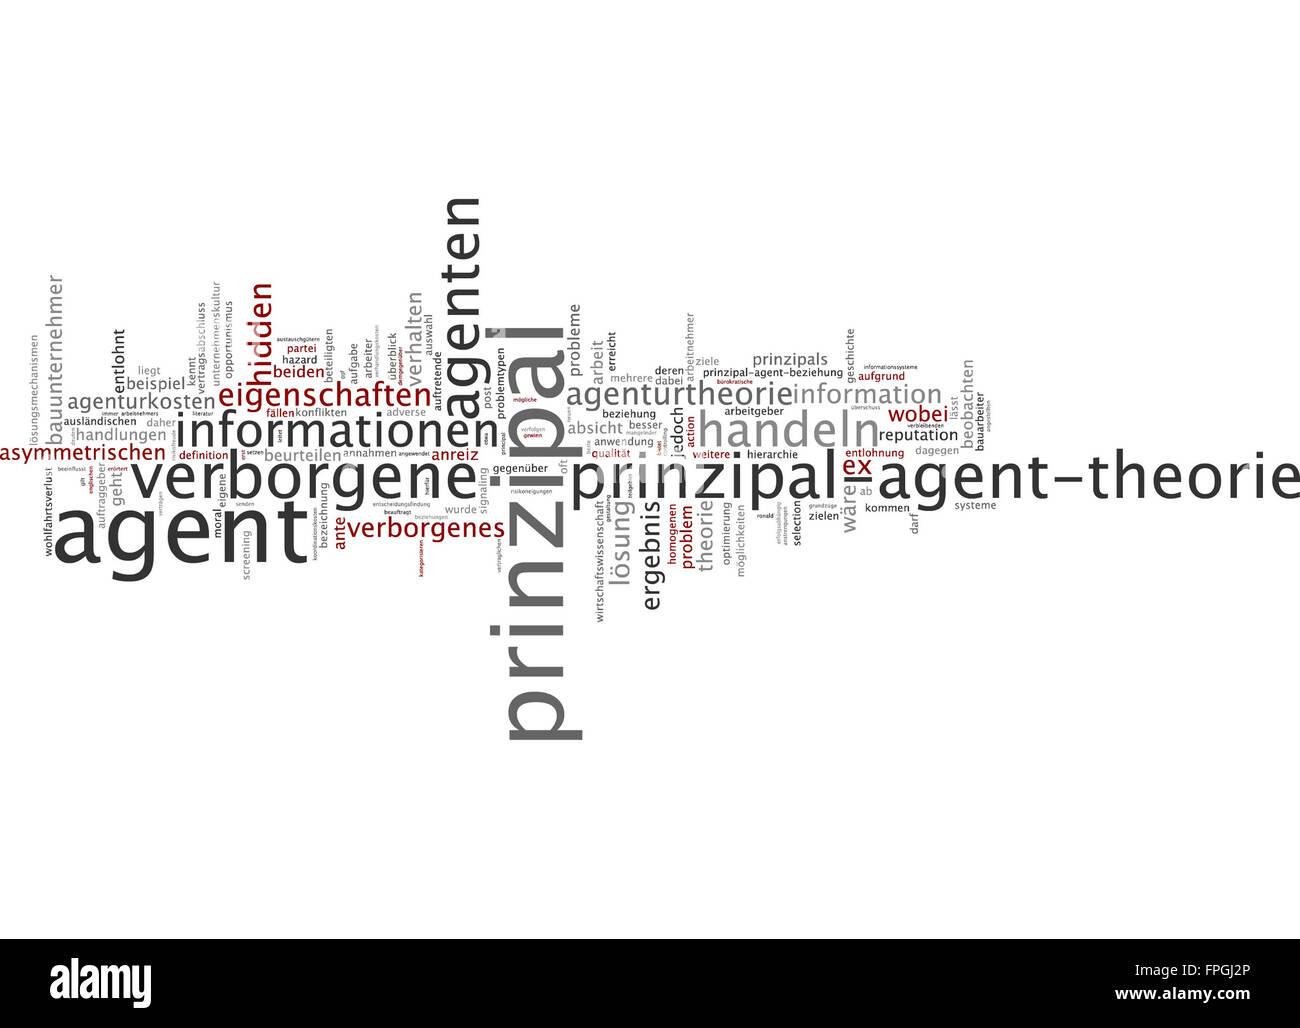 prinzipal agent theorie